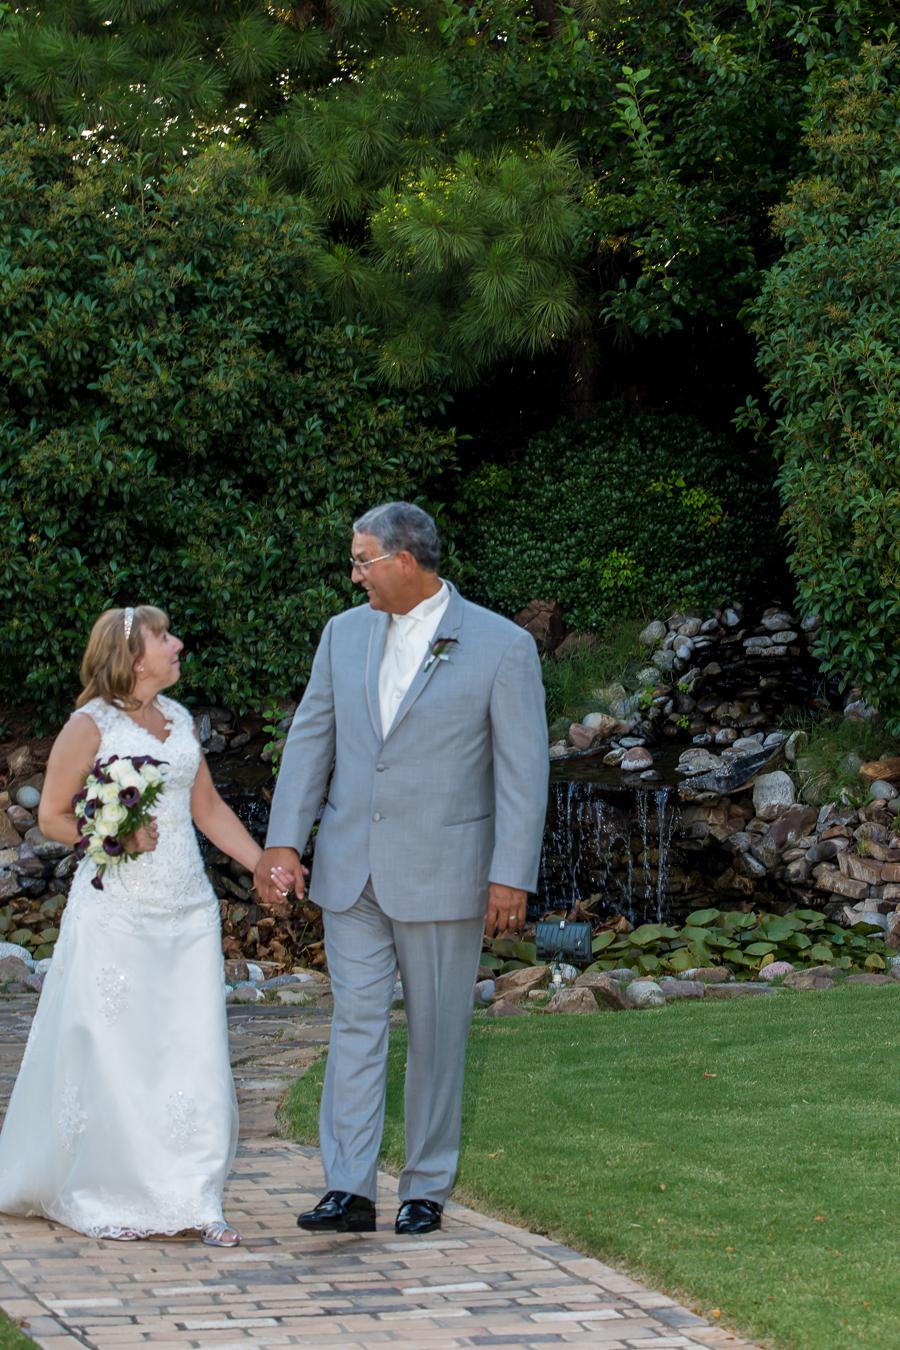 wedding-photographers-oklahoma-city-22.jpg